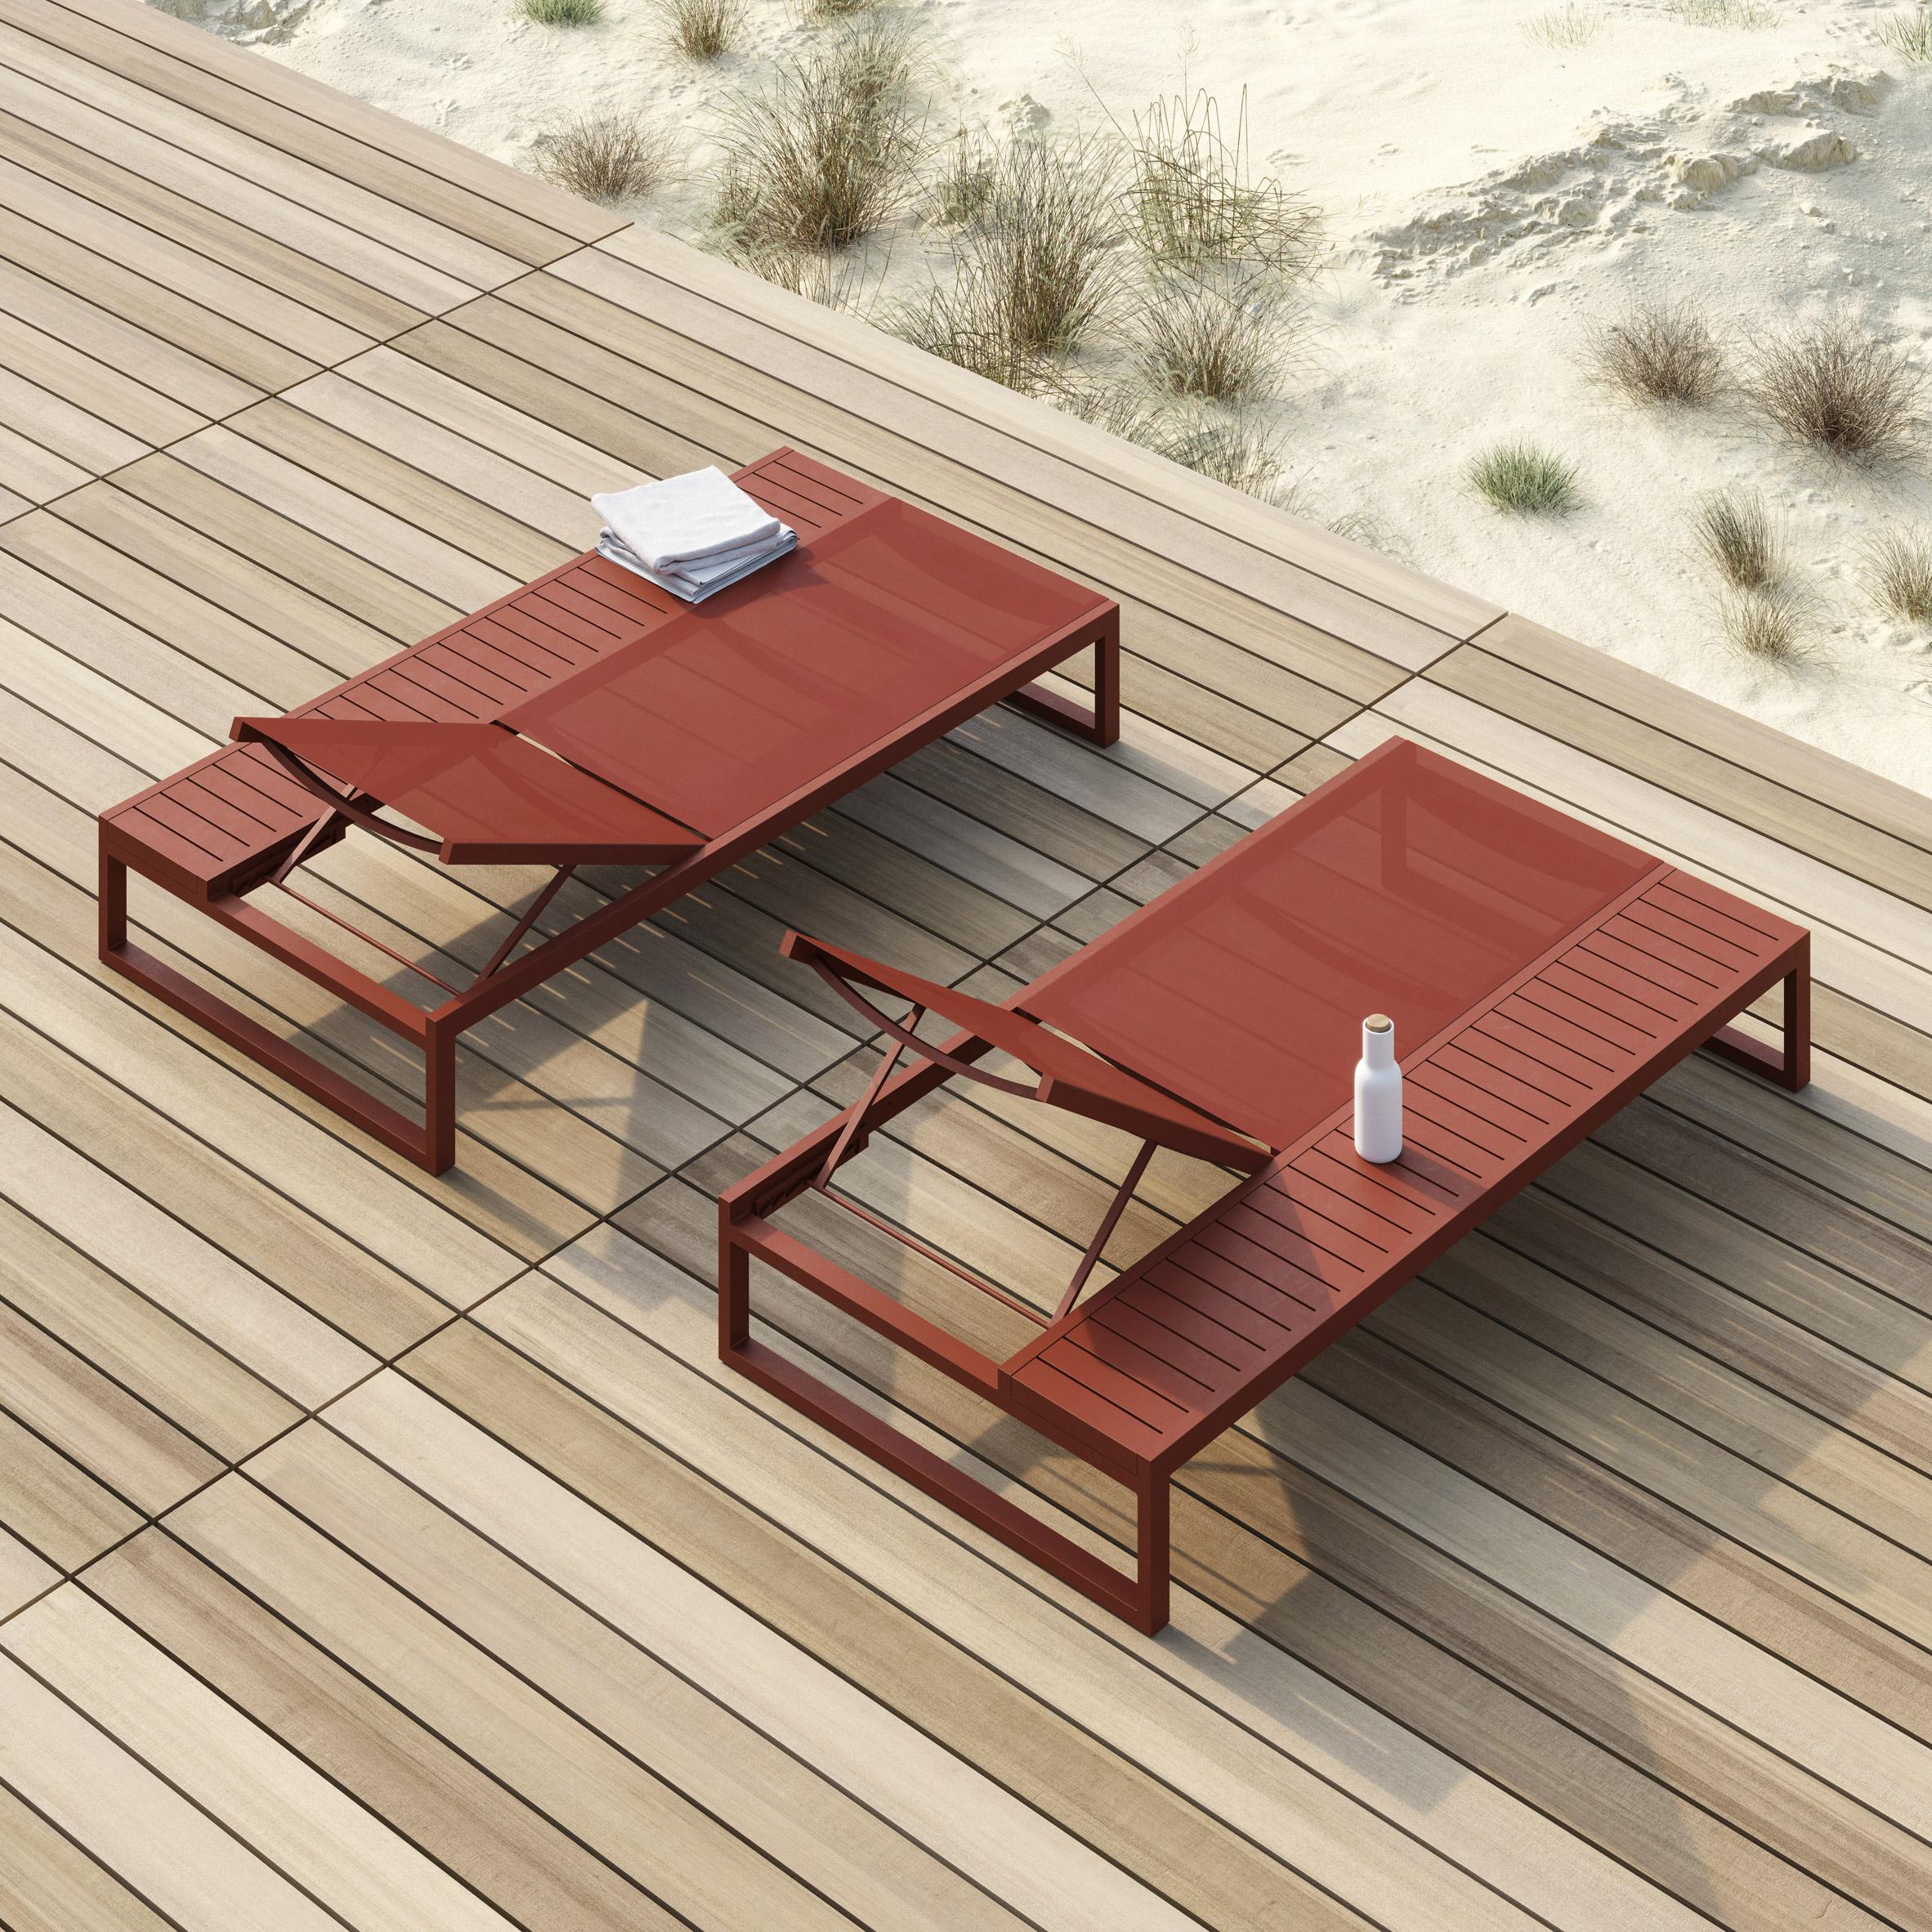 Eos Platform lounger by Matthew Hilton for Case Furniture